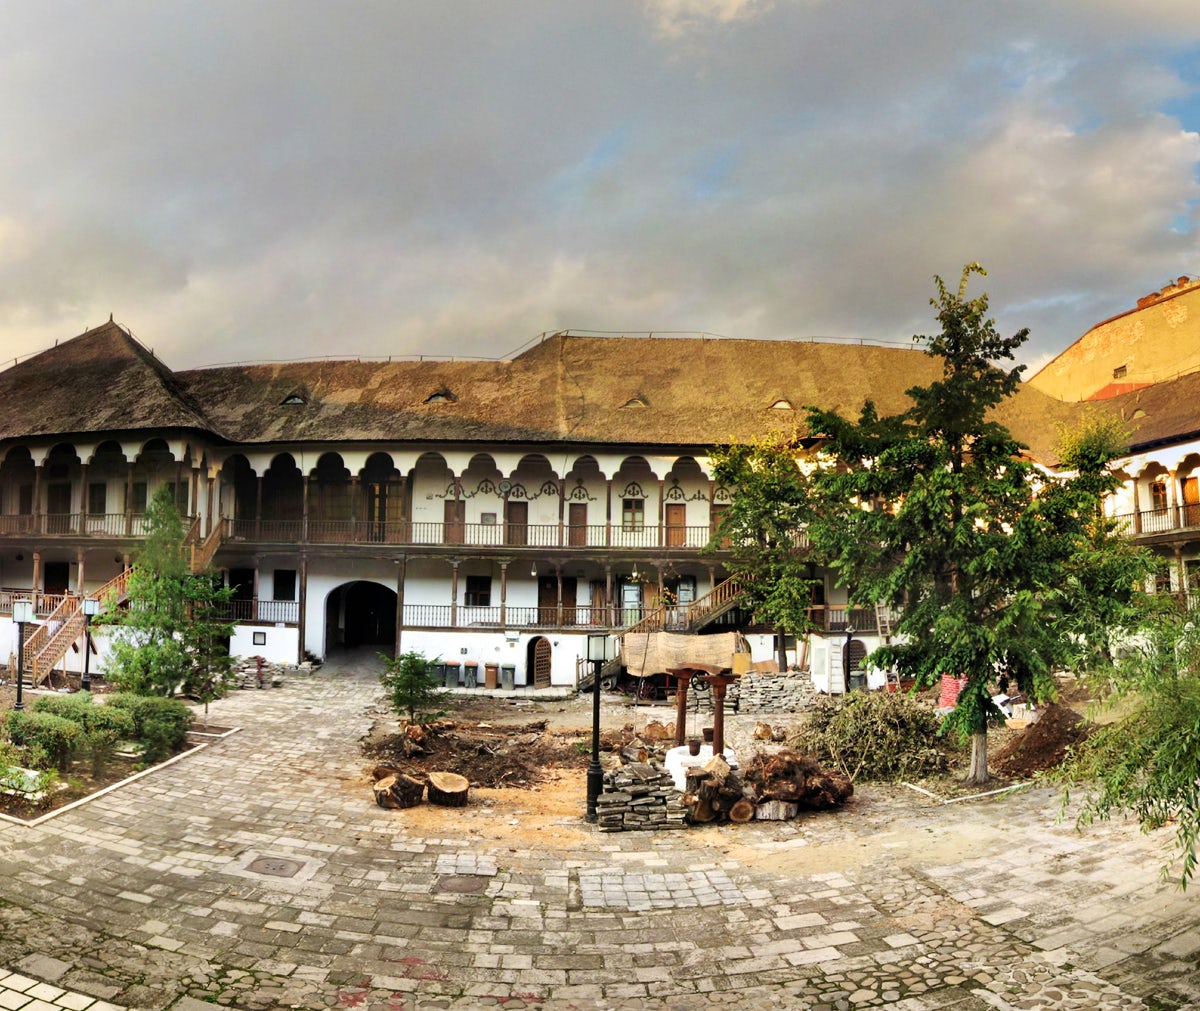 Manuc's Inn: the epicenter of hospitality in Bucharest